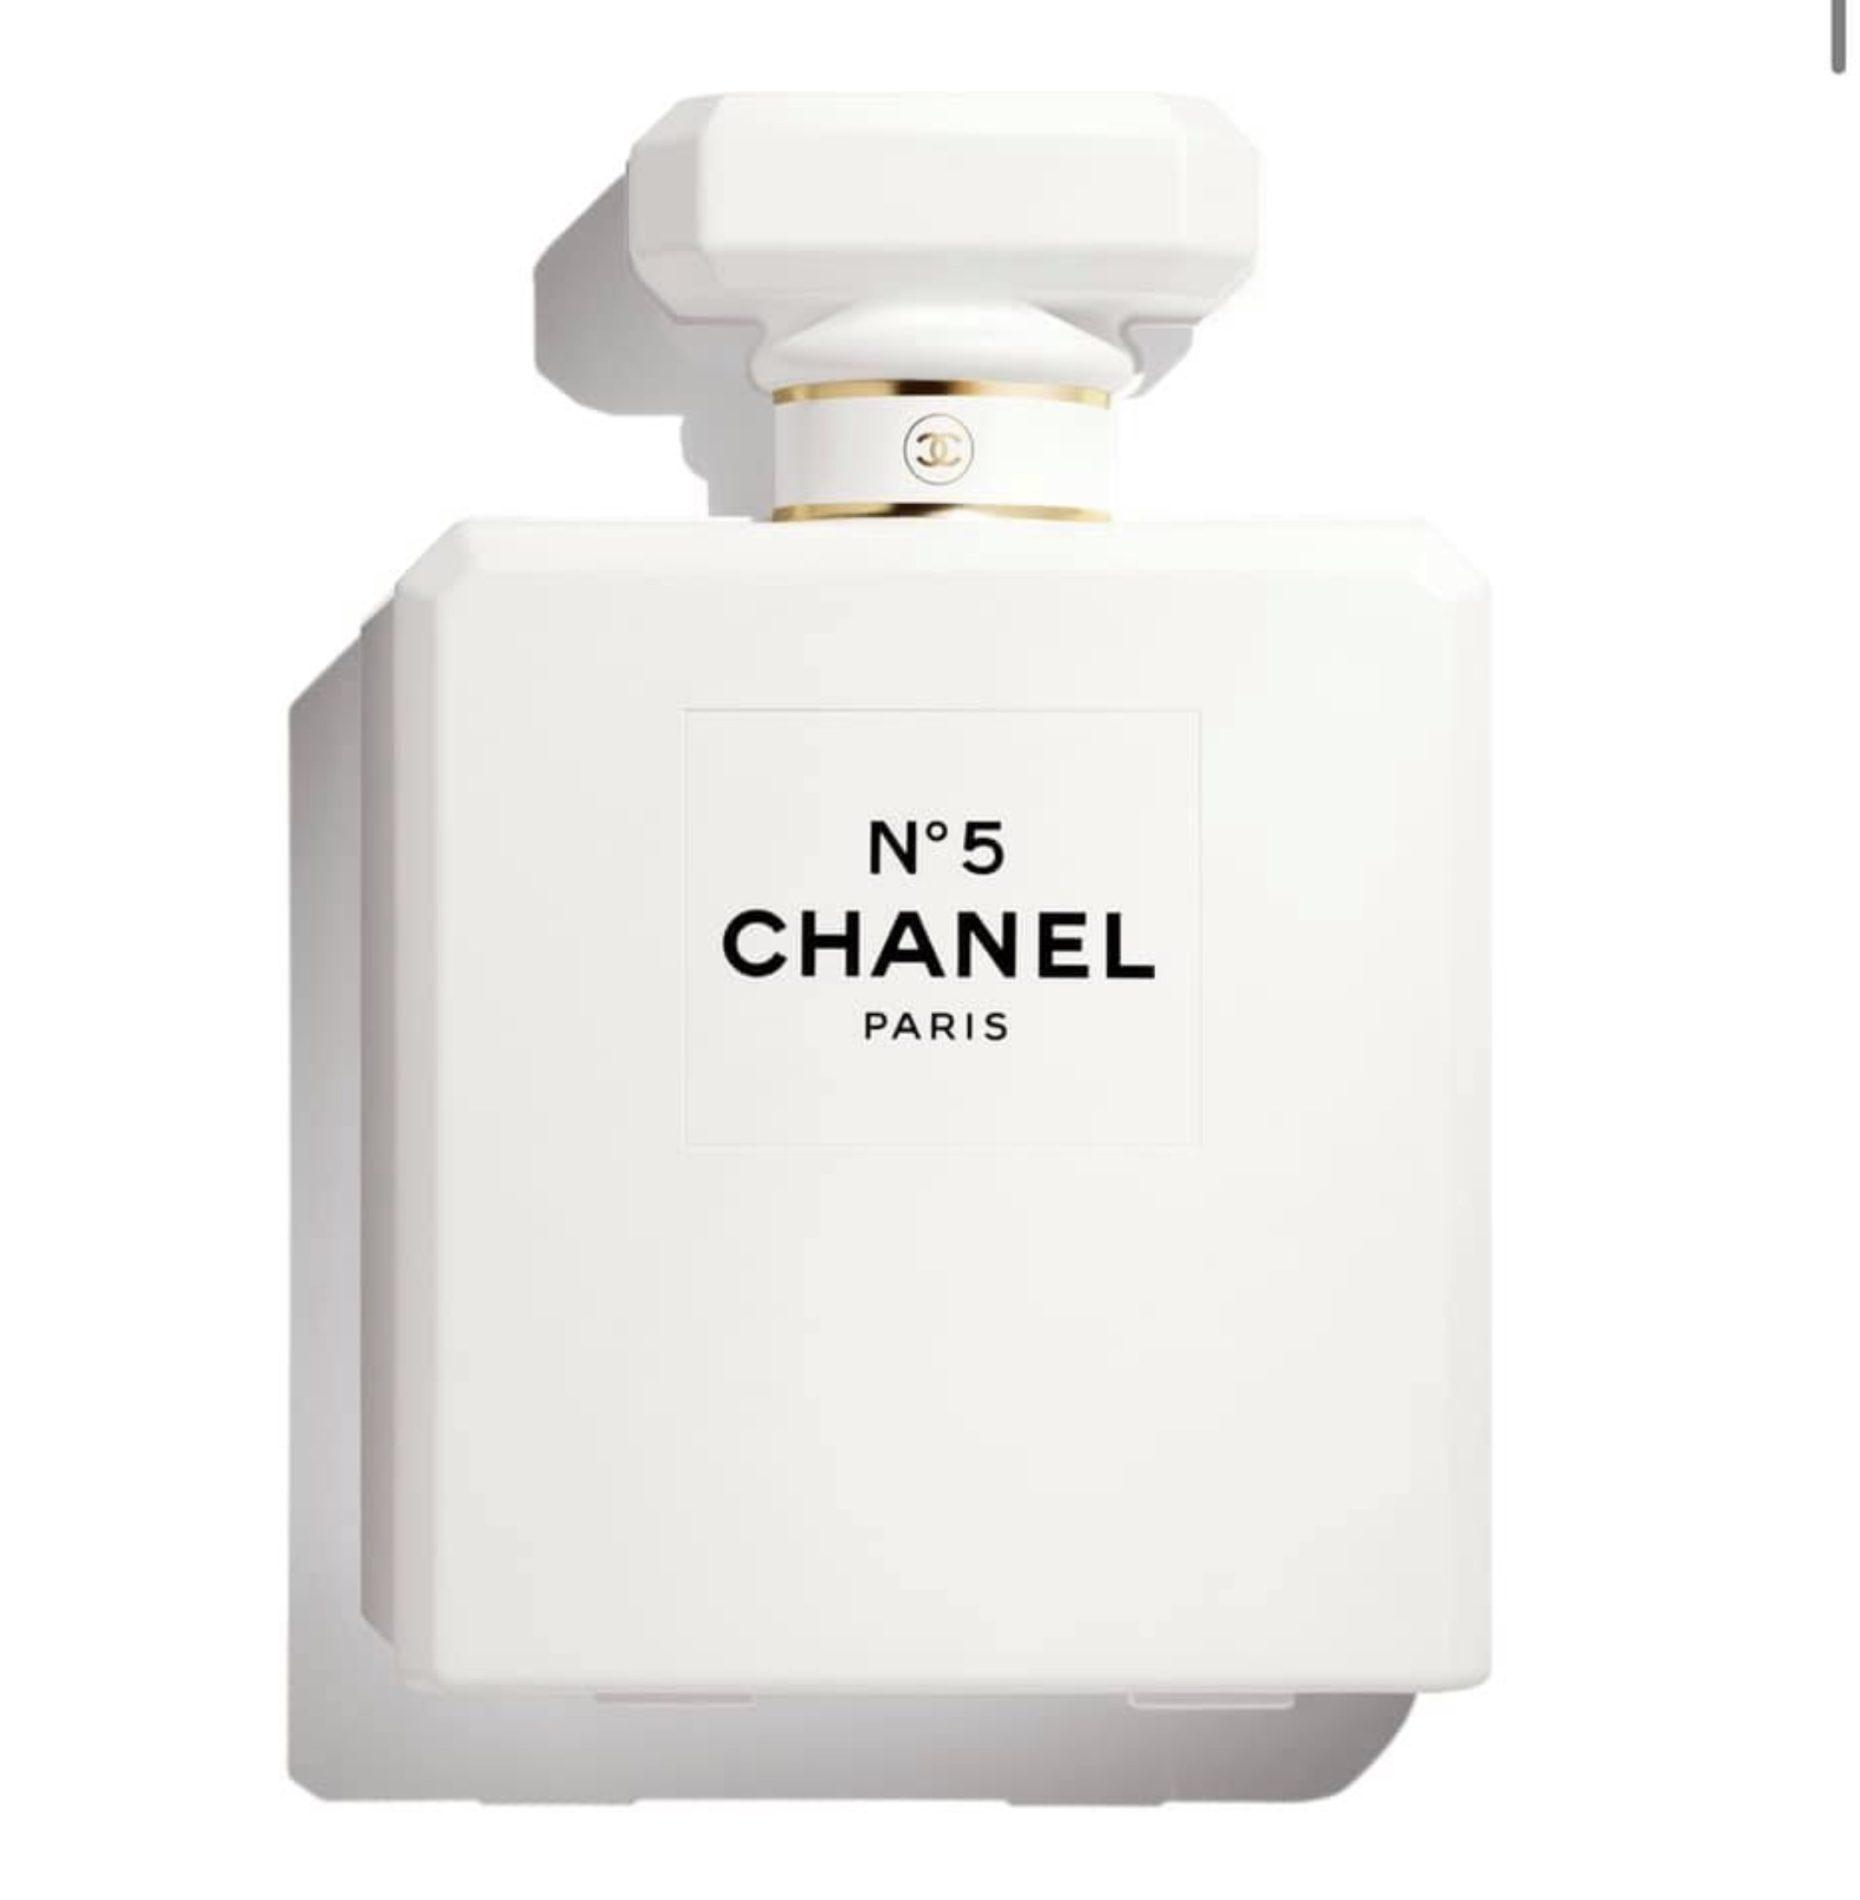 Chanel Beauty 2021 Advent Calendar